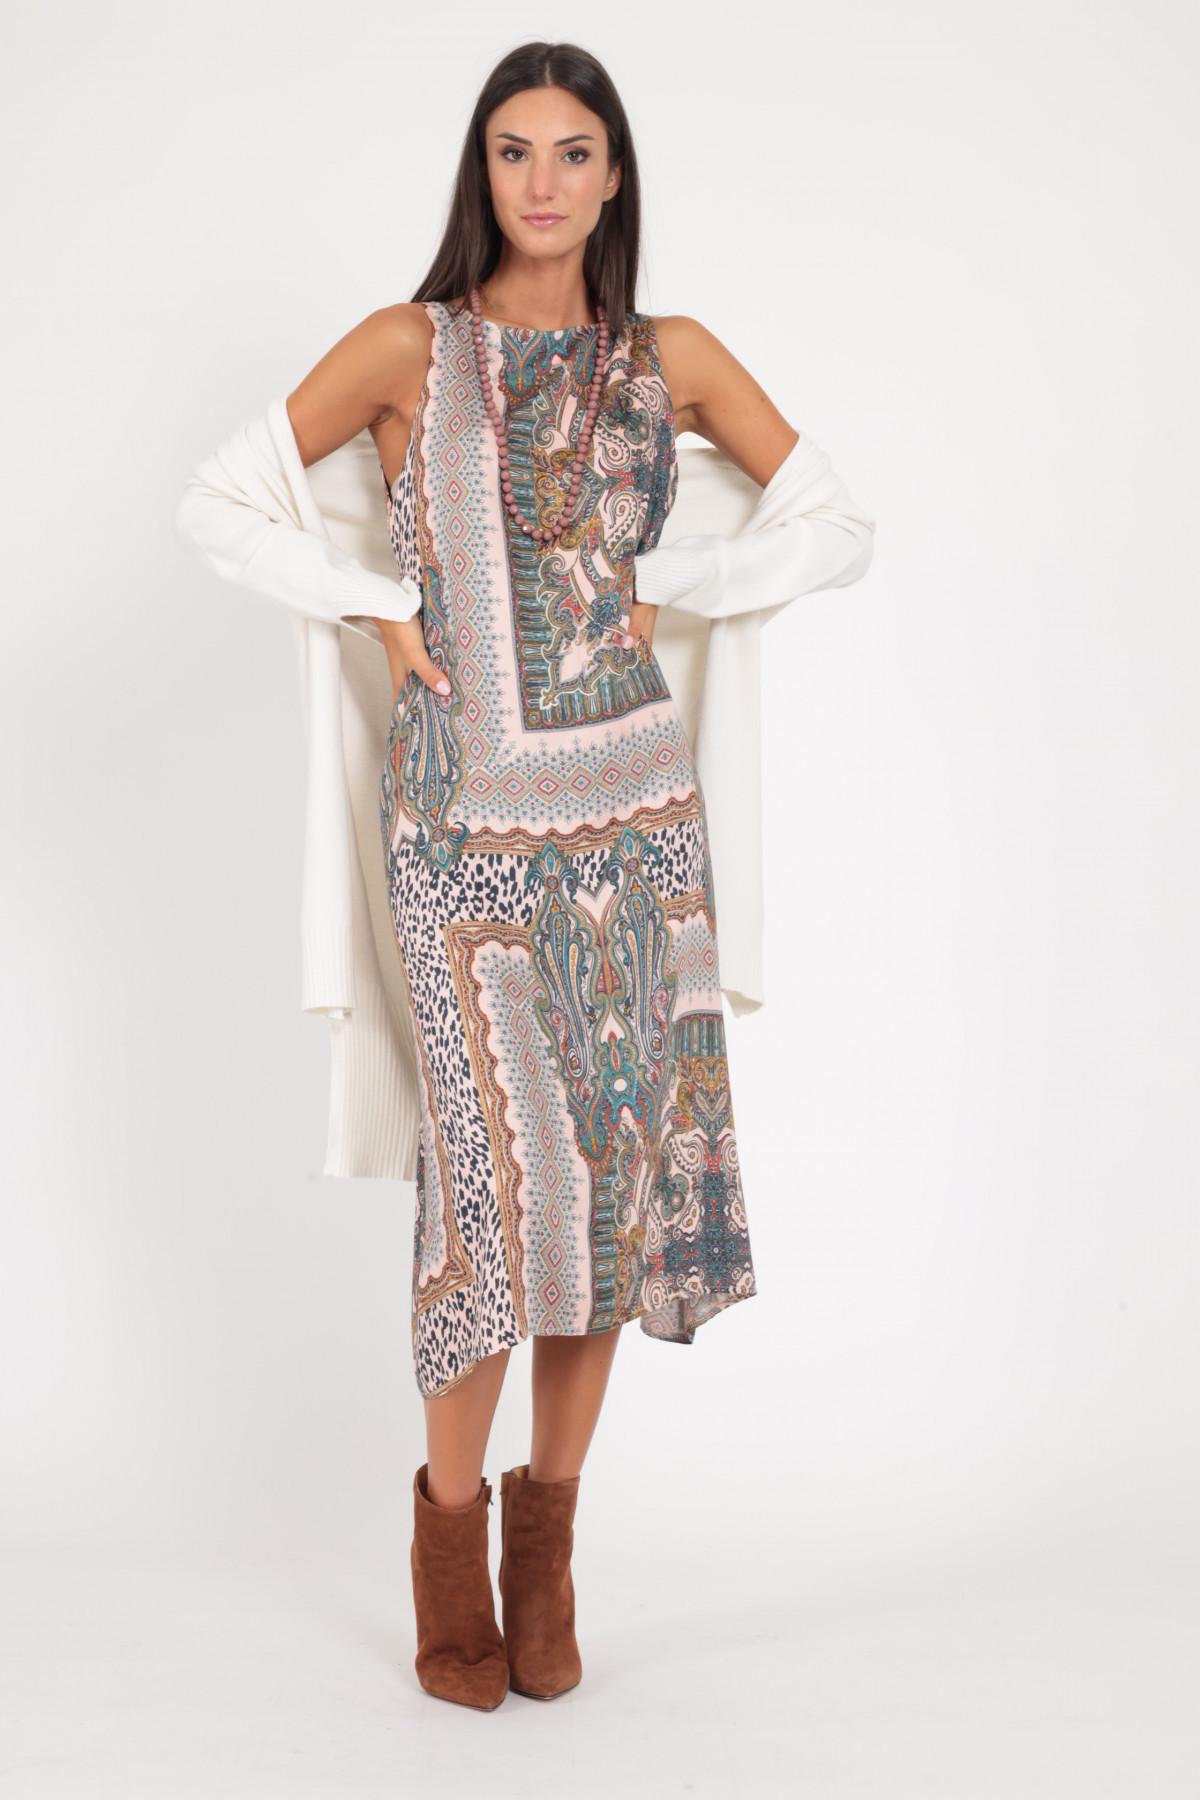 Sleeveless Dress in Patchwork Fantasy Print